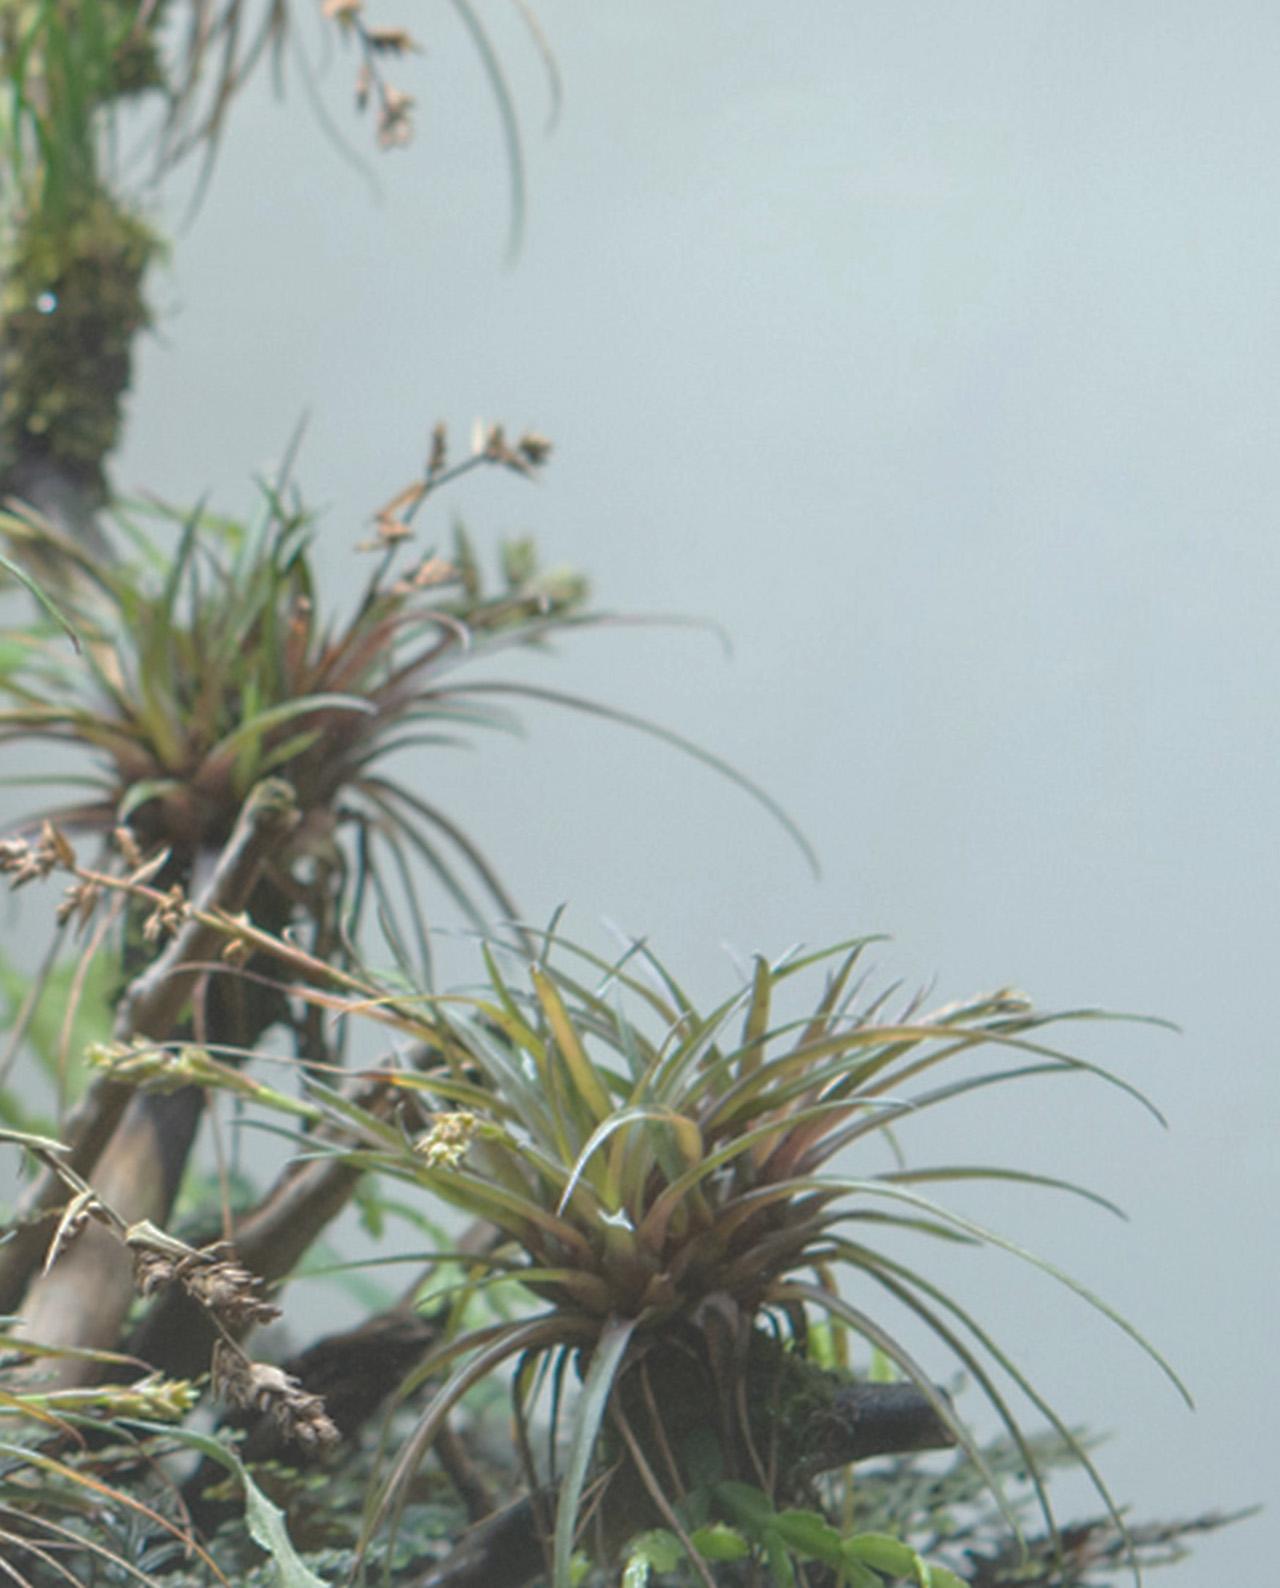 dark_banner_rainforest_terrarium11_mobile